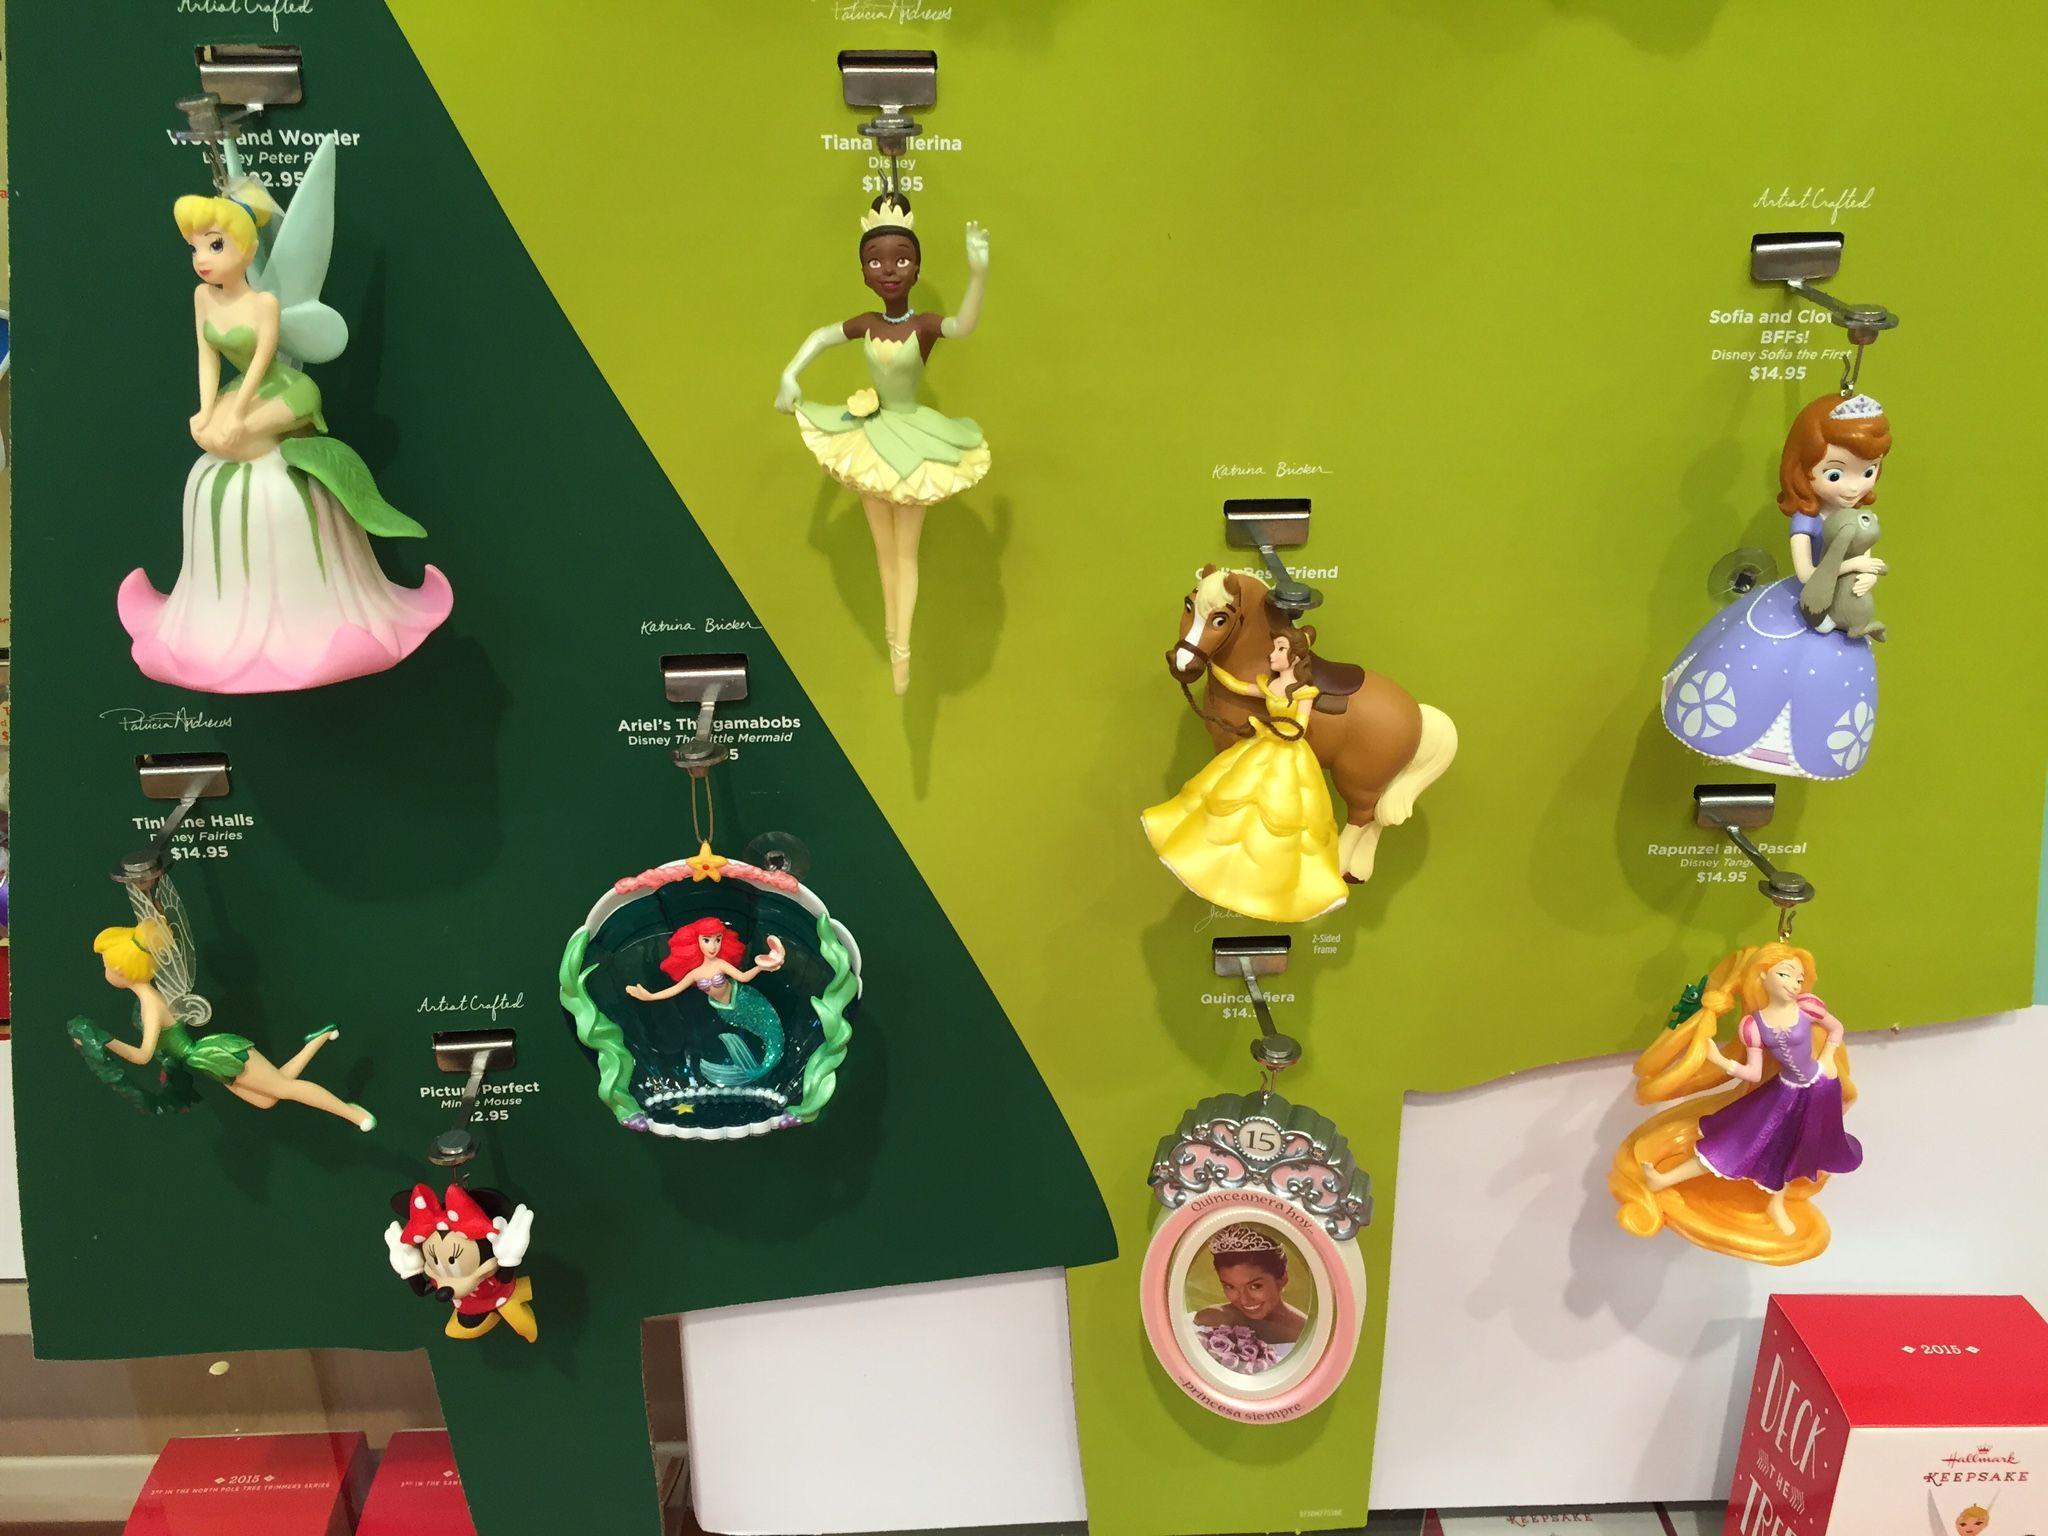 Disney Hallmark Keepsake Ornaments 2015 Release 1 Wdw Radio Your Walt Disney World Inform Disney Princess Ornaments Hallmark Keepsake Ornaments Ornaments